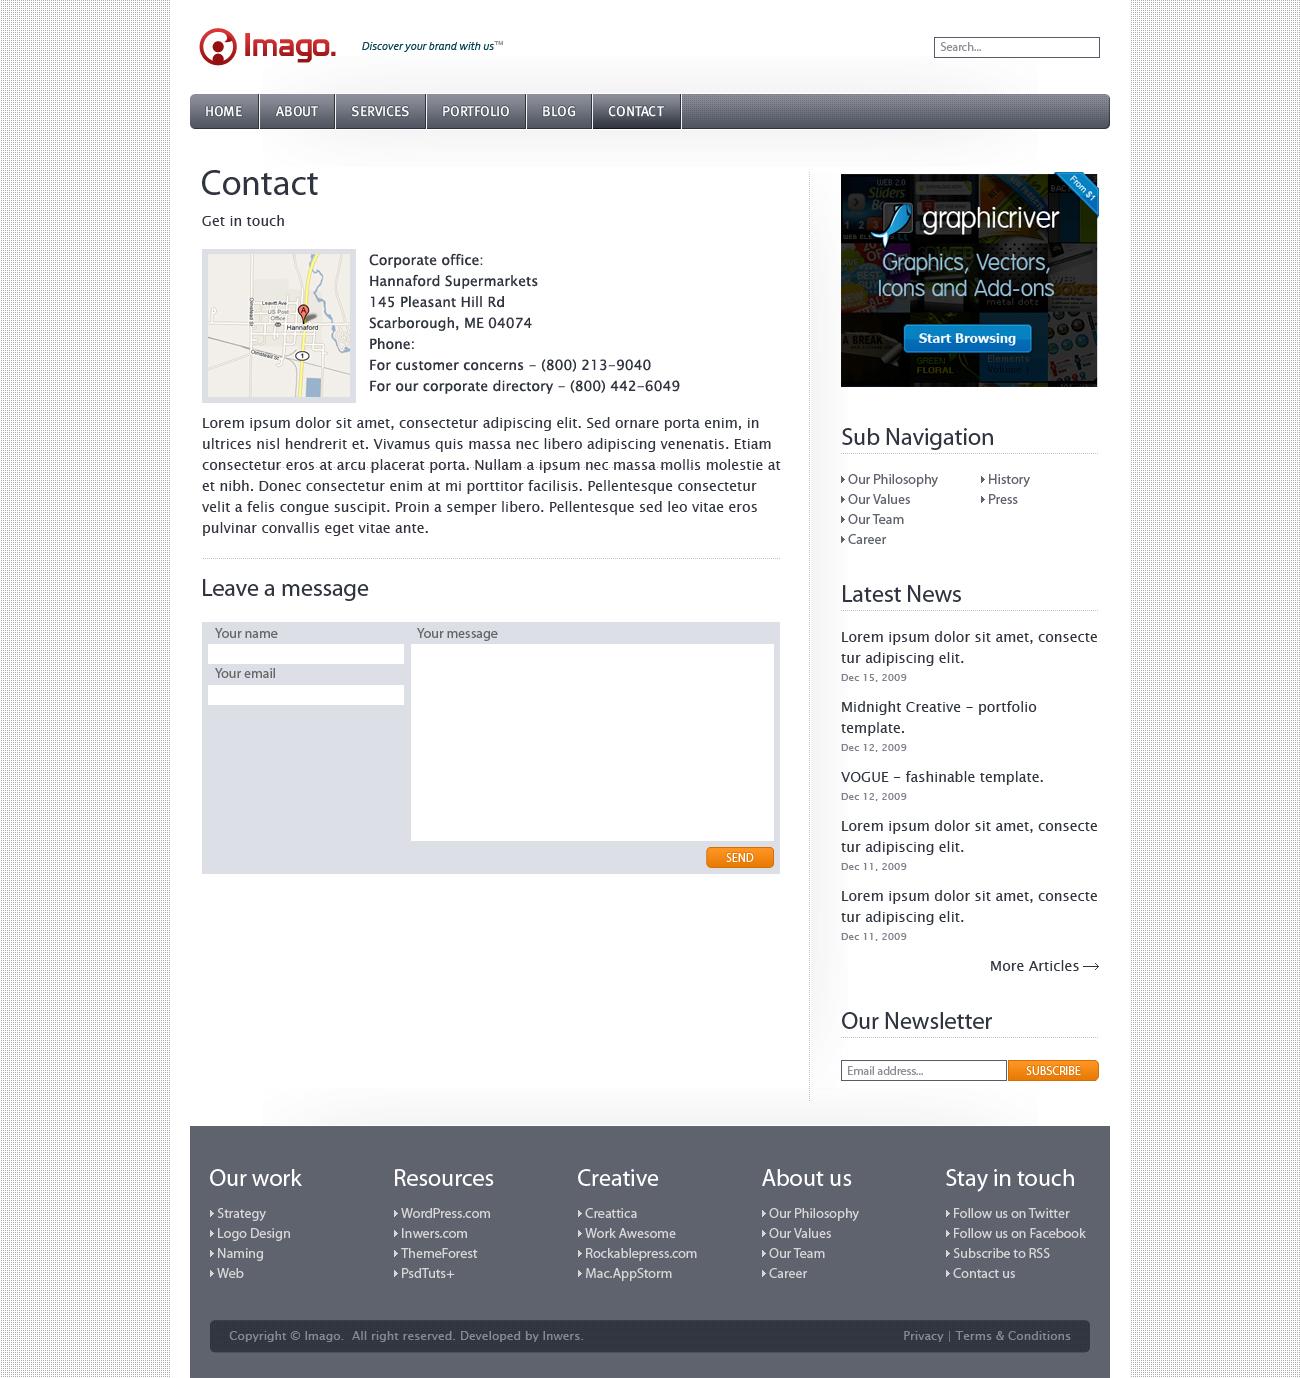 Imago - Business and Portfolio Template - 6_imago_contact